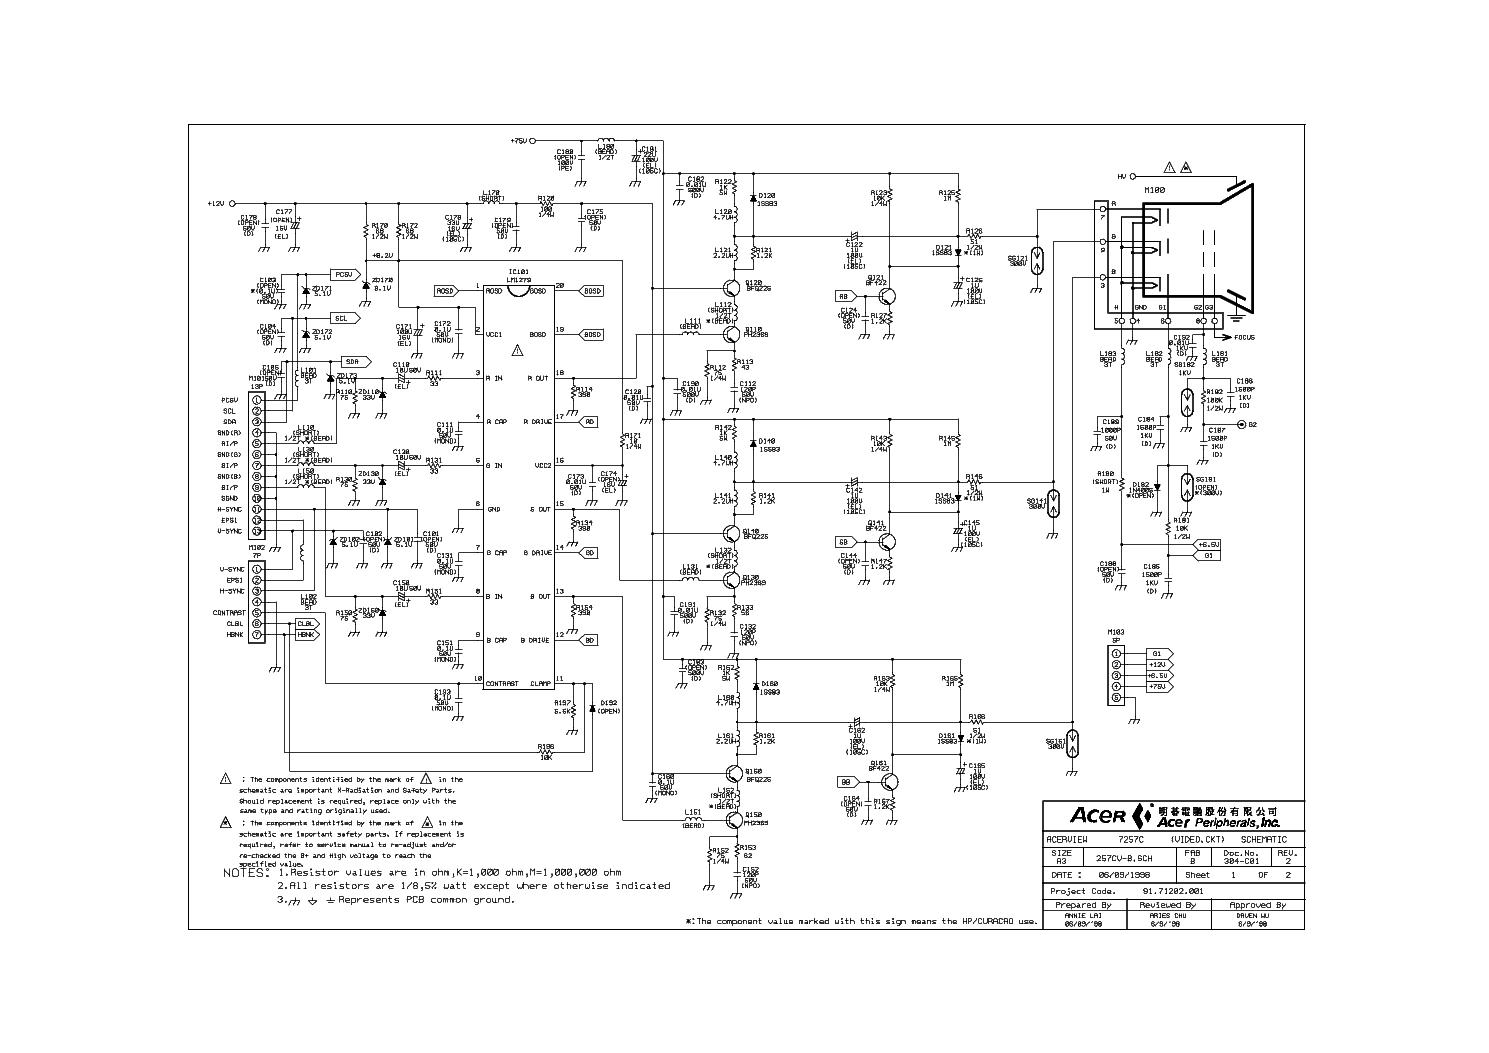 Acer Al722 Sch Service Manual Download Schematics Eeprom